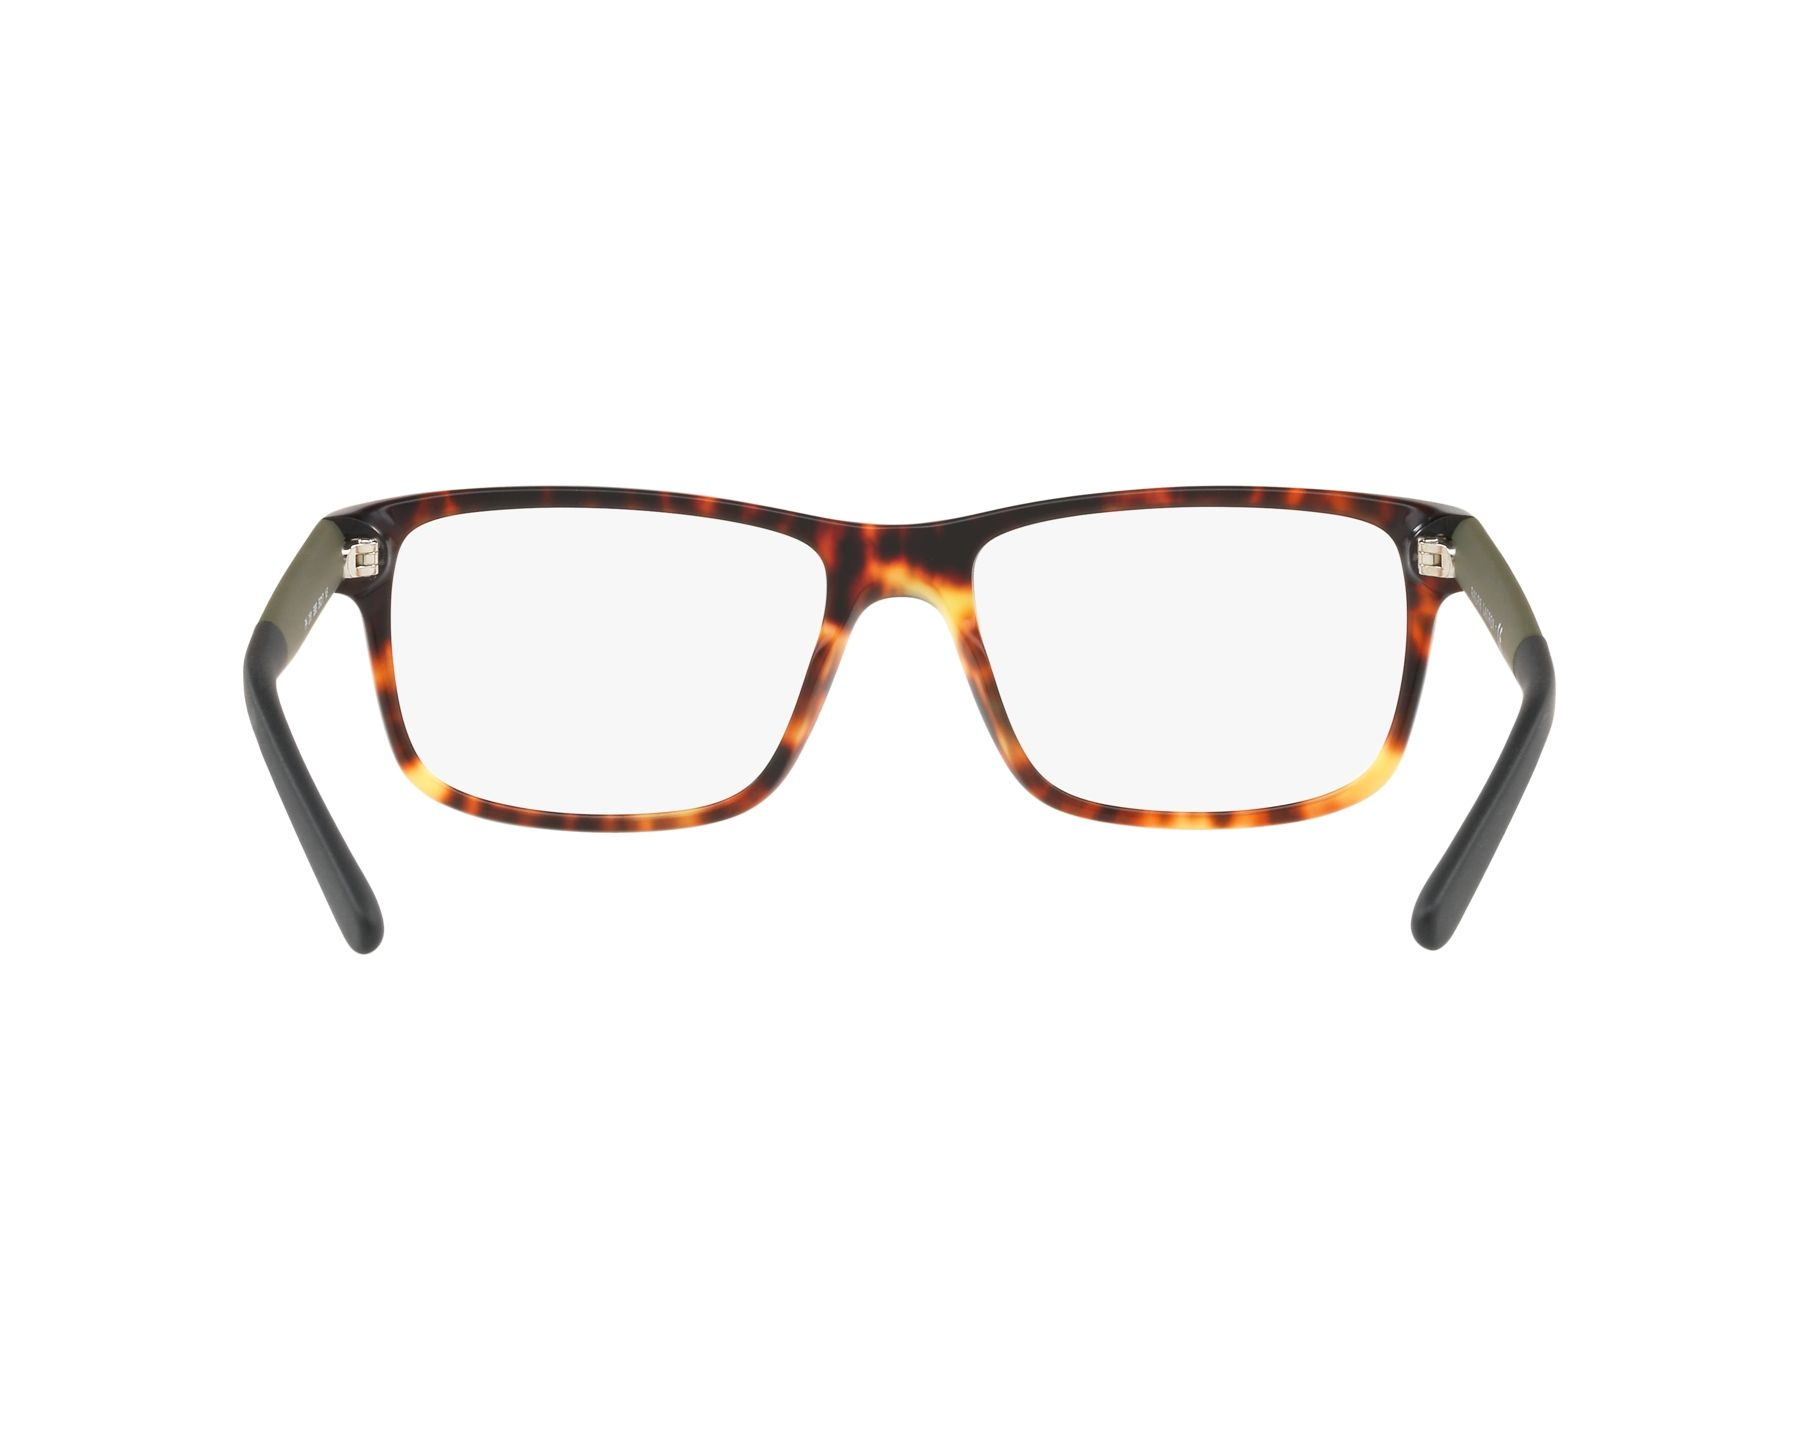 7c1f8004b7 Gafas Graduadas Polo Ralph Lauren PH-2181 5665 53-17 Havana Verde Vista de